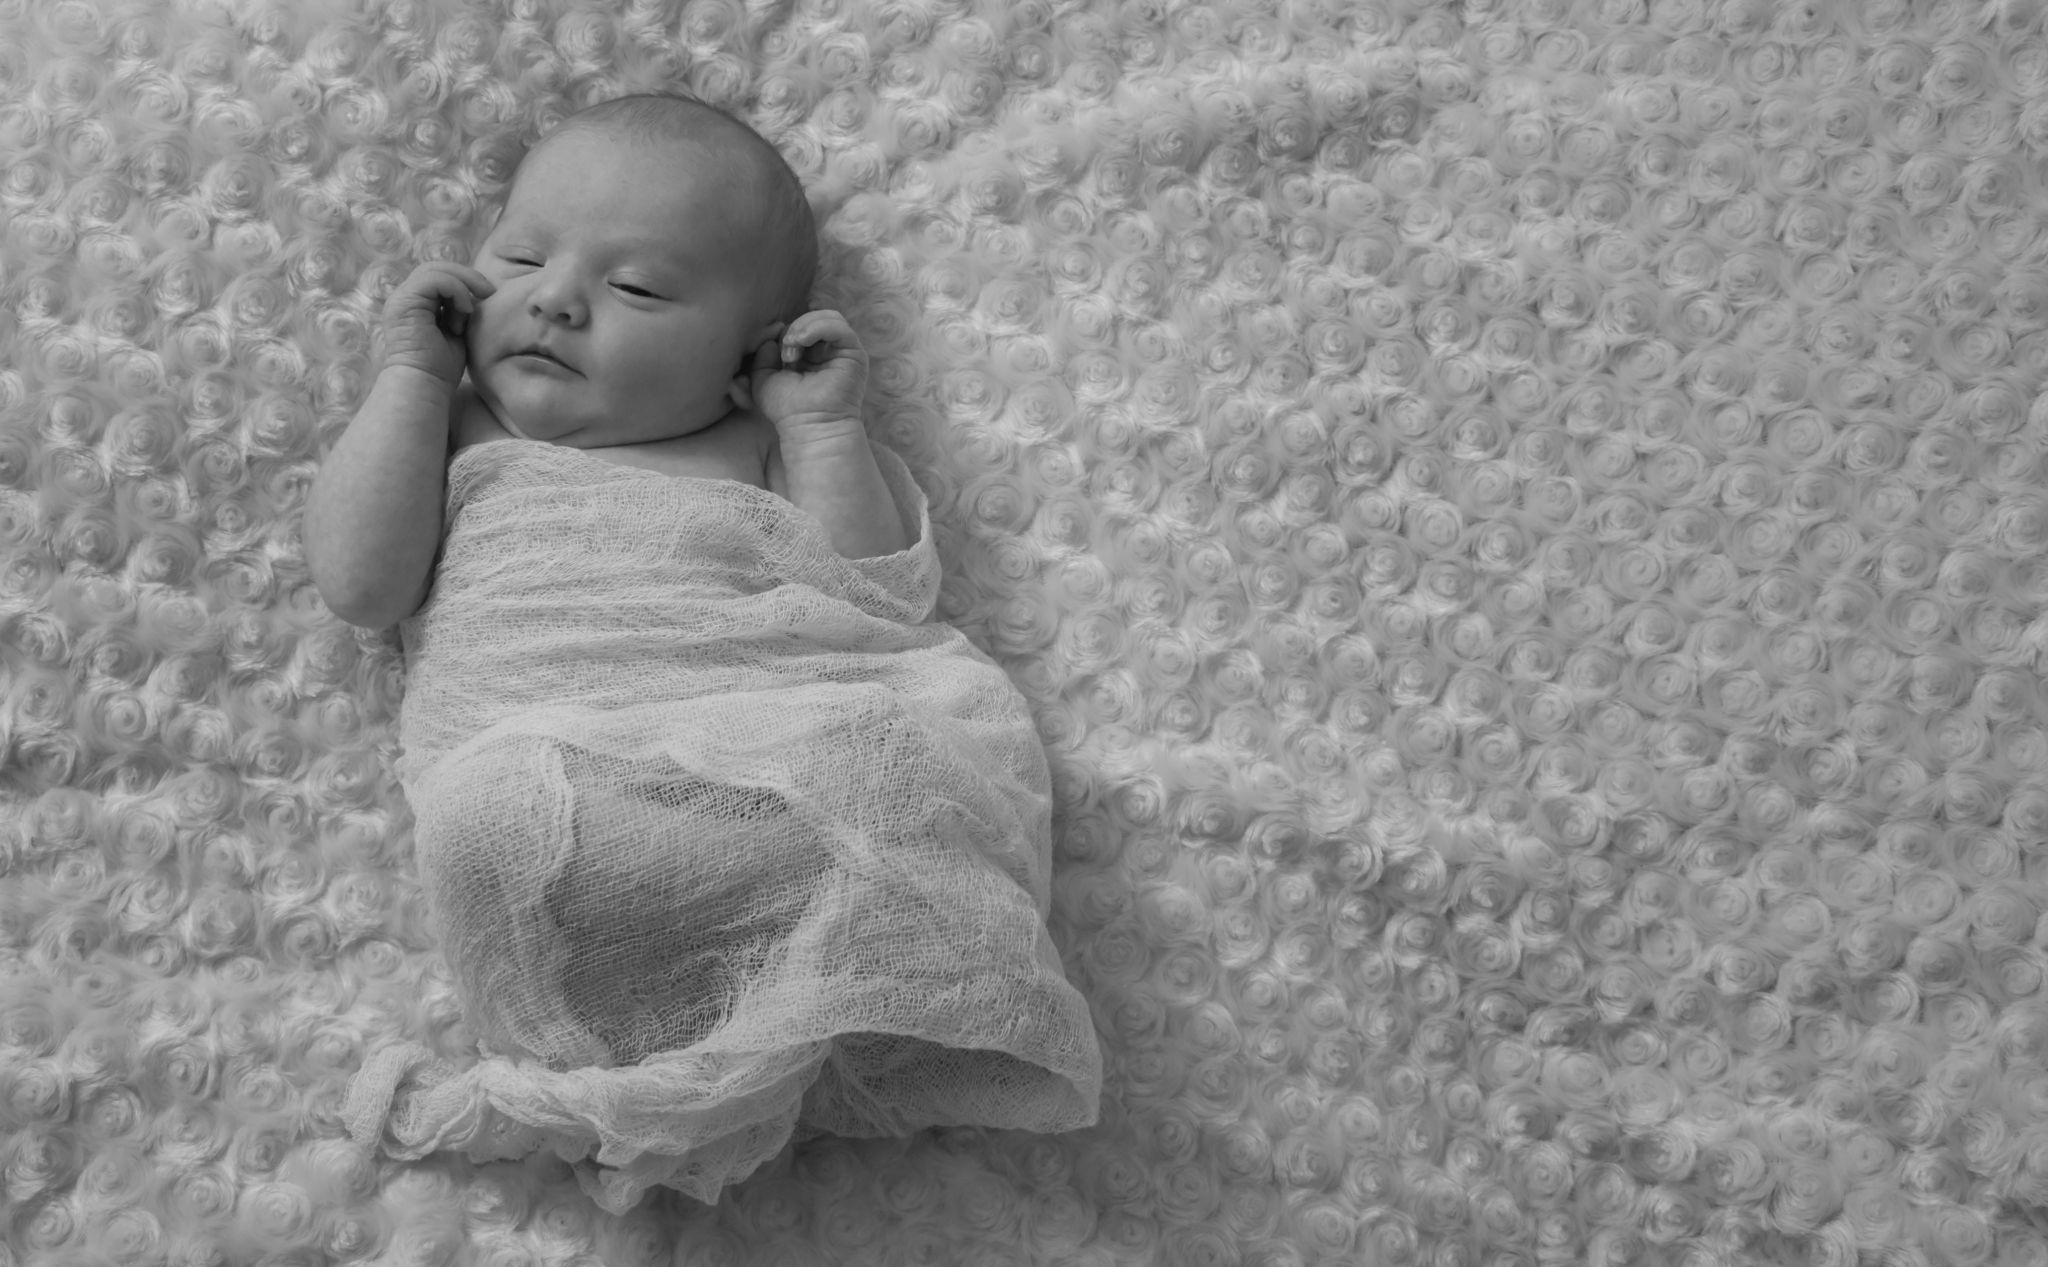 baby kloey by Lindsay Ramsey